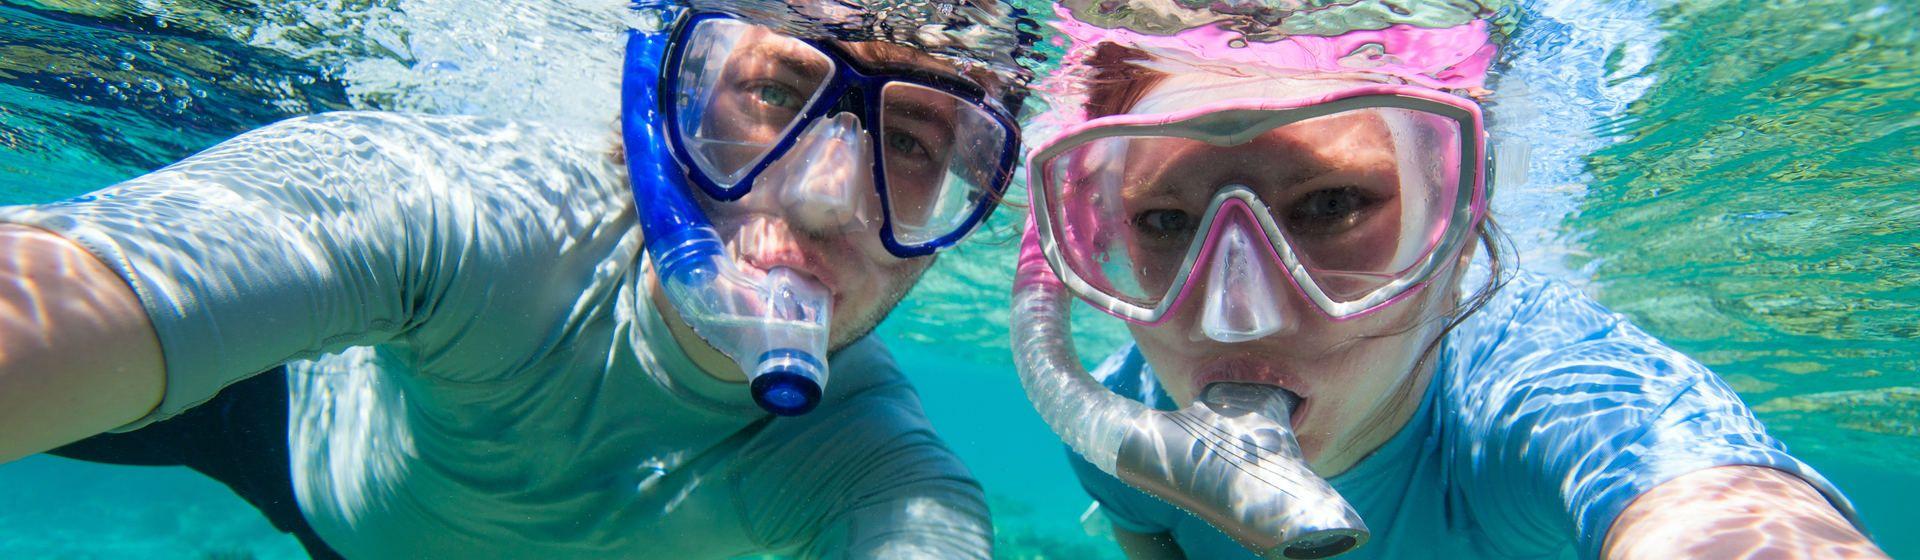 Como tirar fotos embaixo d'água? Dicas para conseguir a foto perfeita